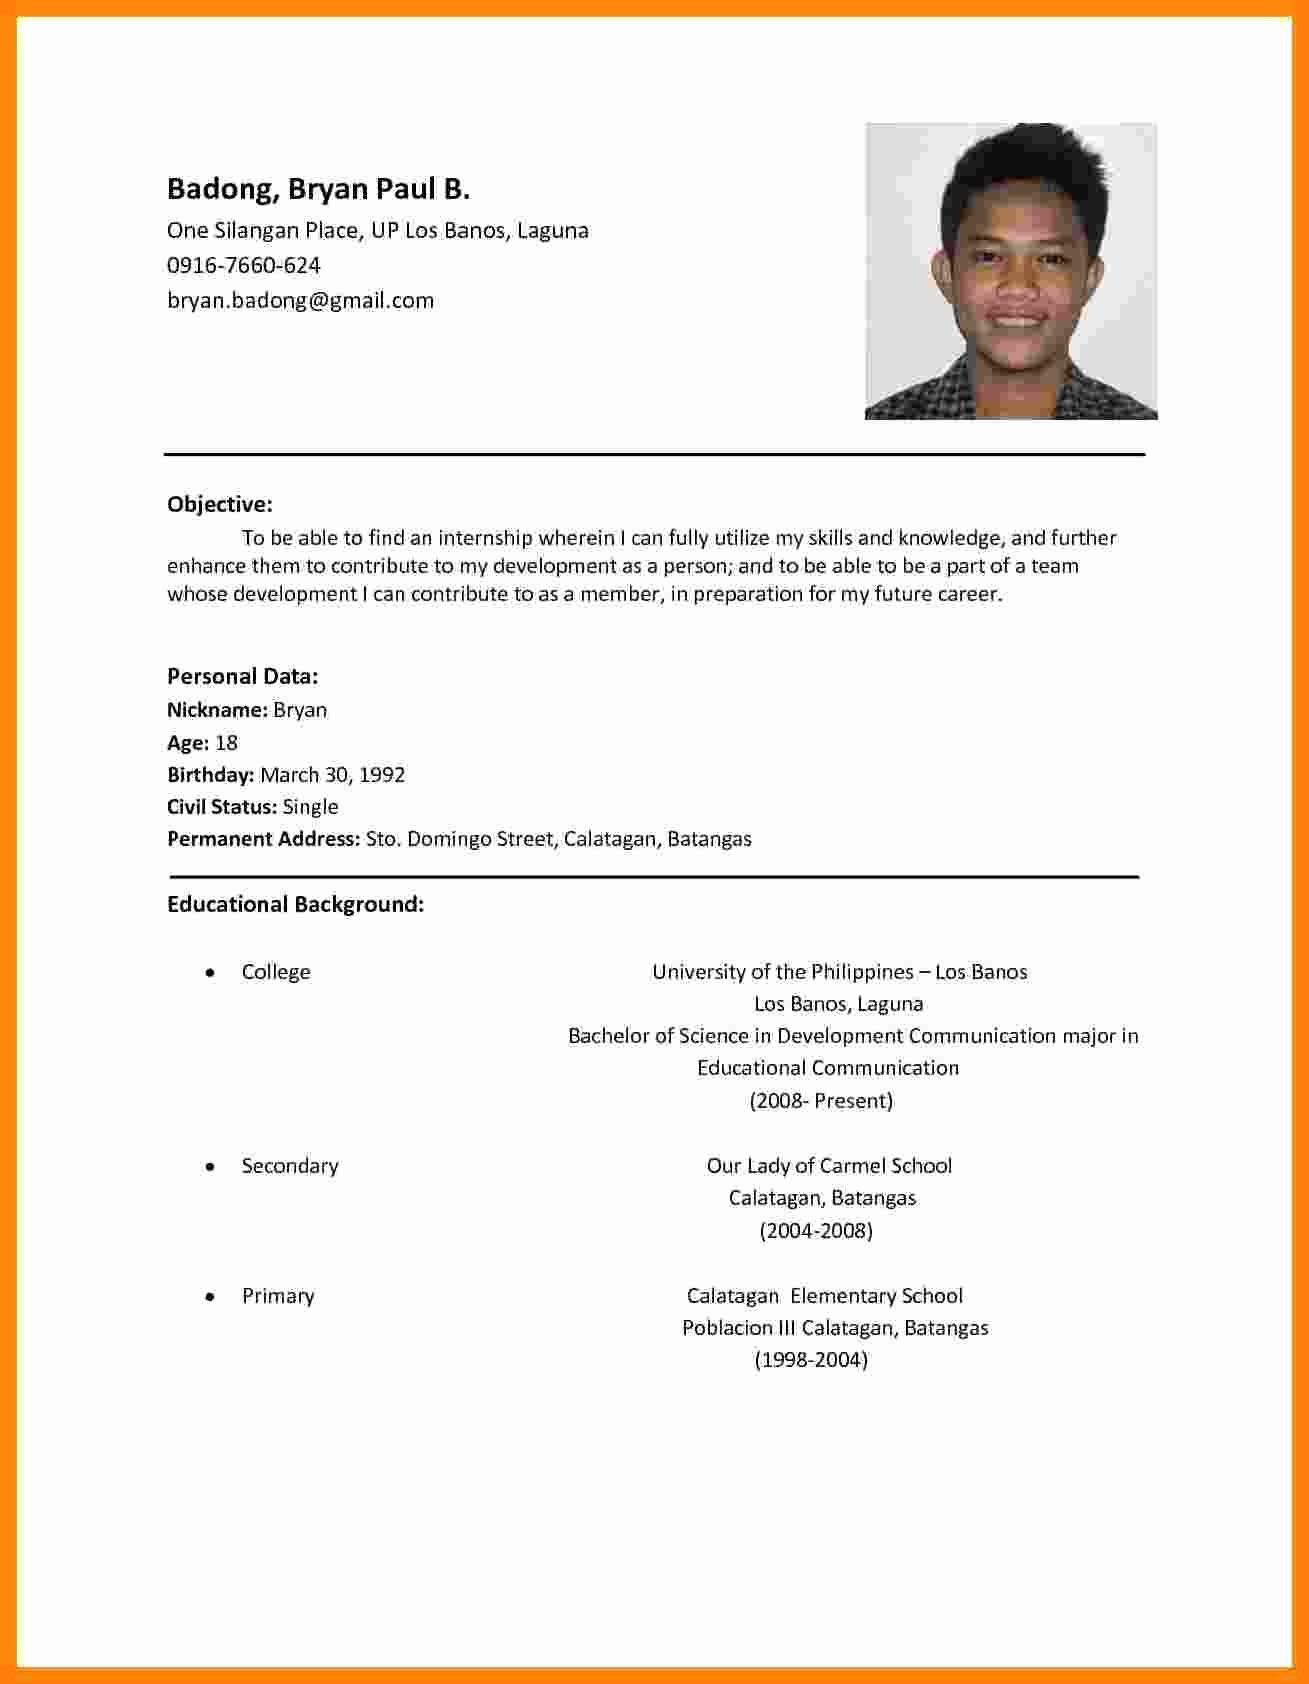 Job Application Sample Pdf Awesome 5 Cv Sample for Job Application Pdf